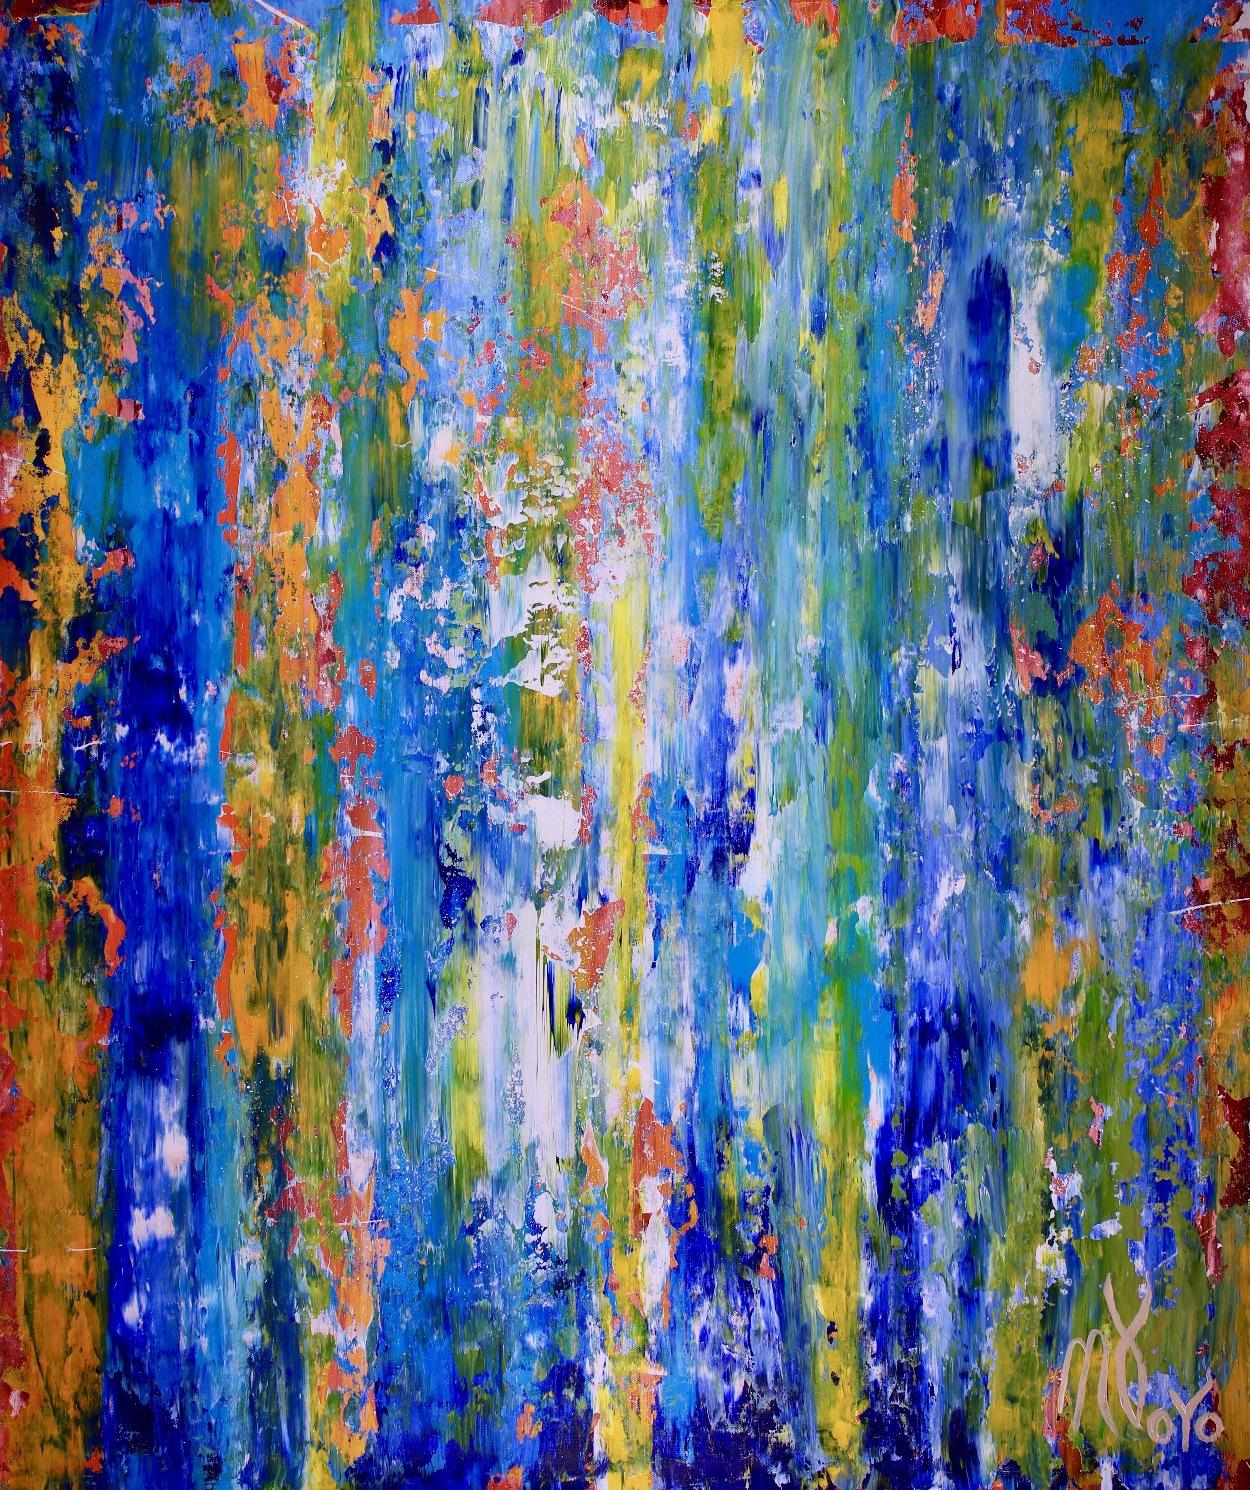 Organic Color Fusion 2 (2018) Acrylic painting by Nestor Toro